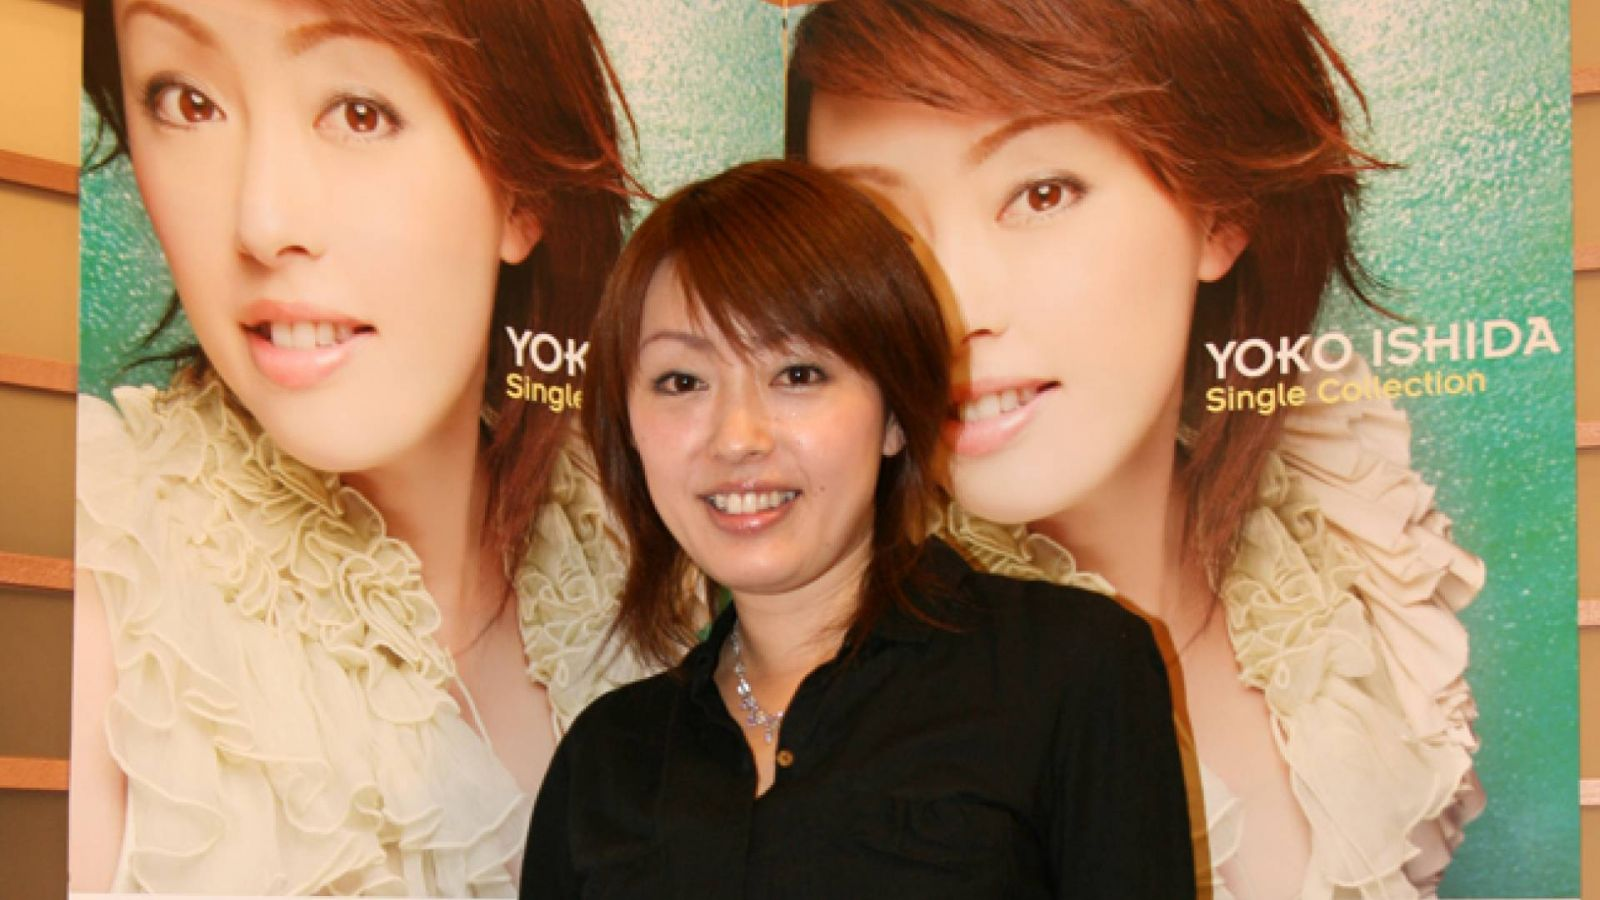 Wywiad z Yoko Ishidą © Ishida Yoko - JaME - Philippe Hayot